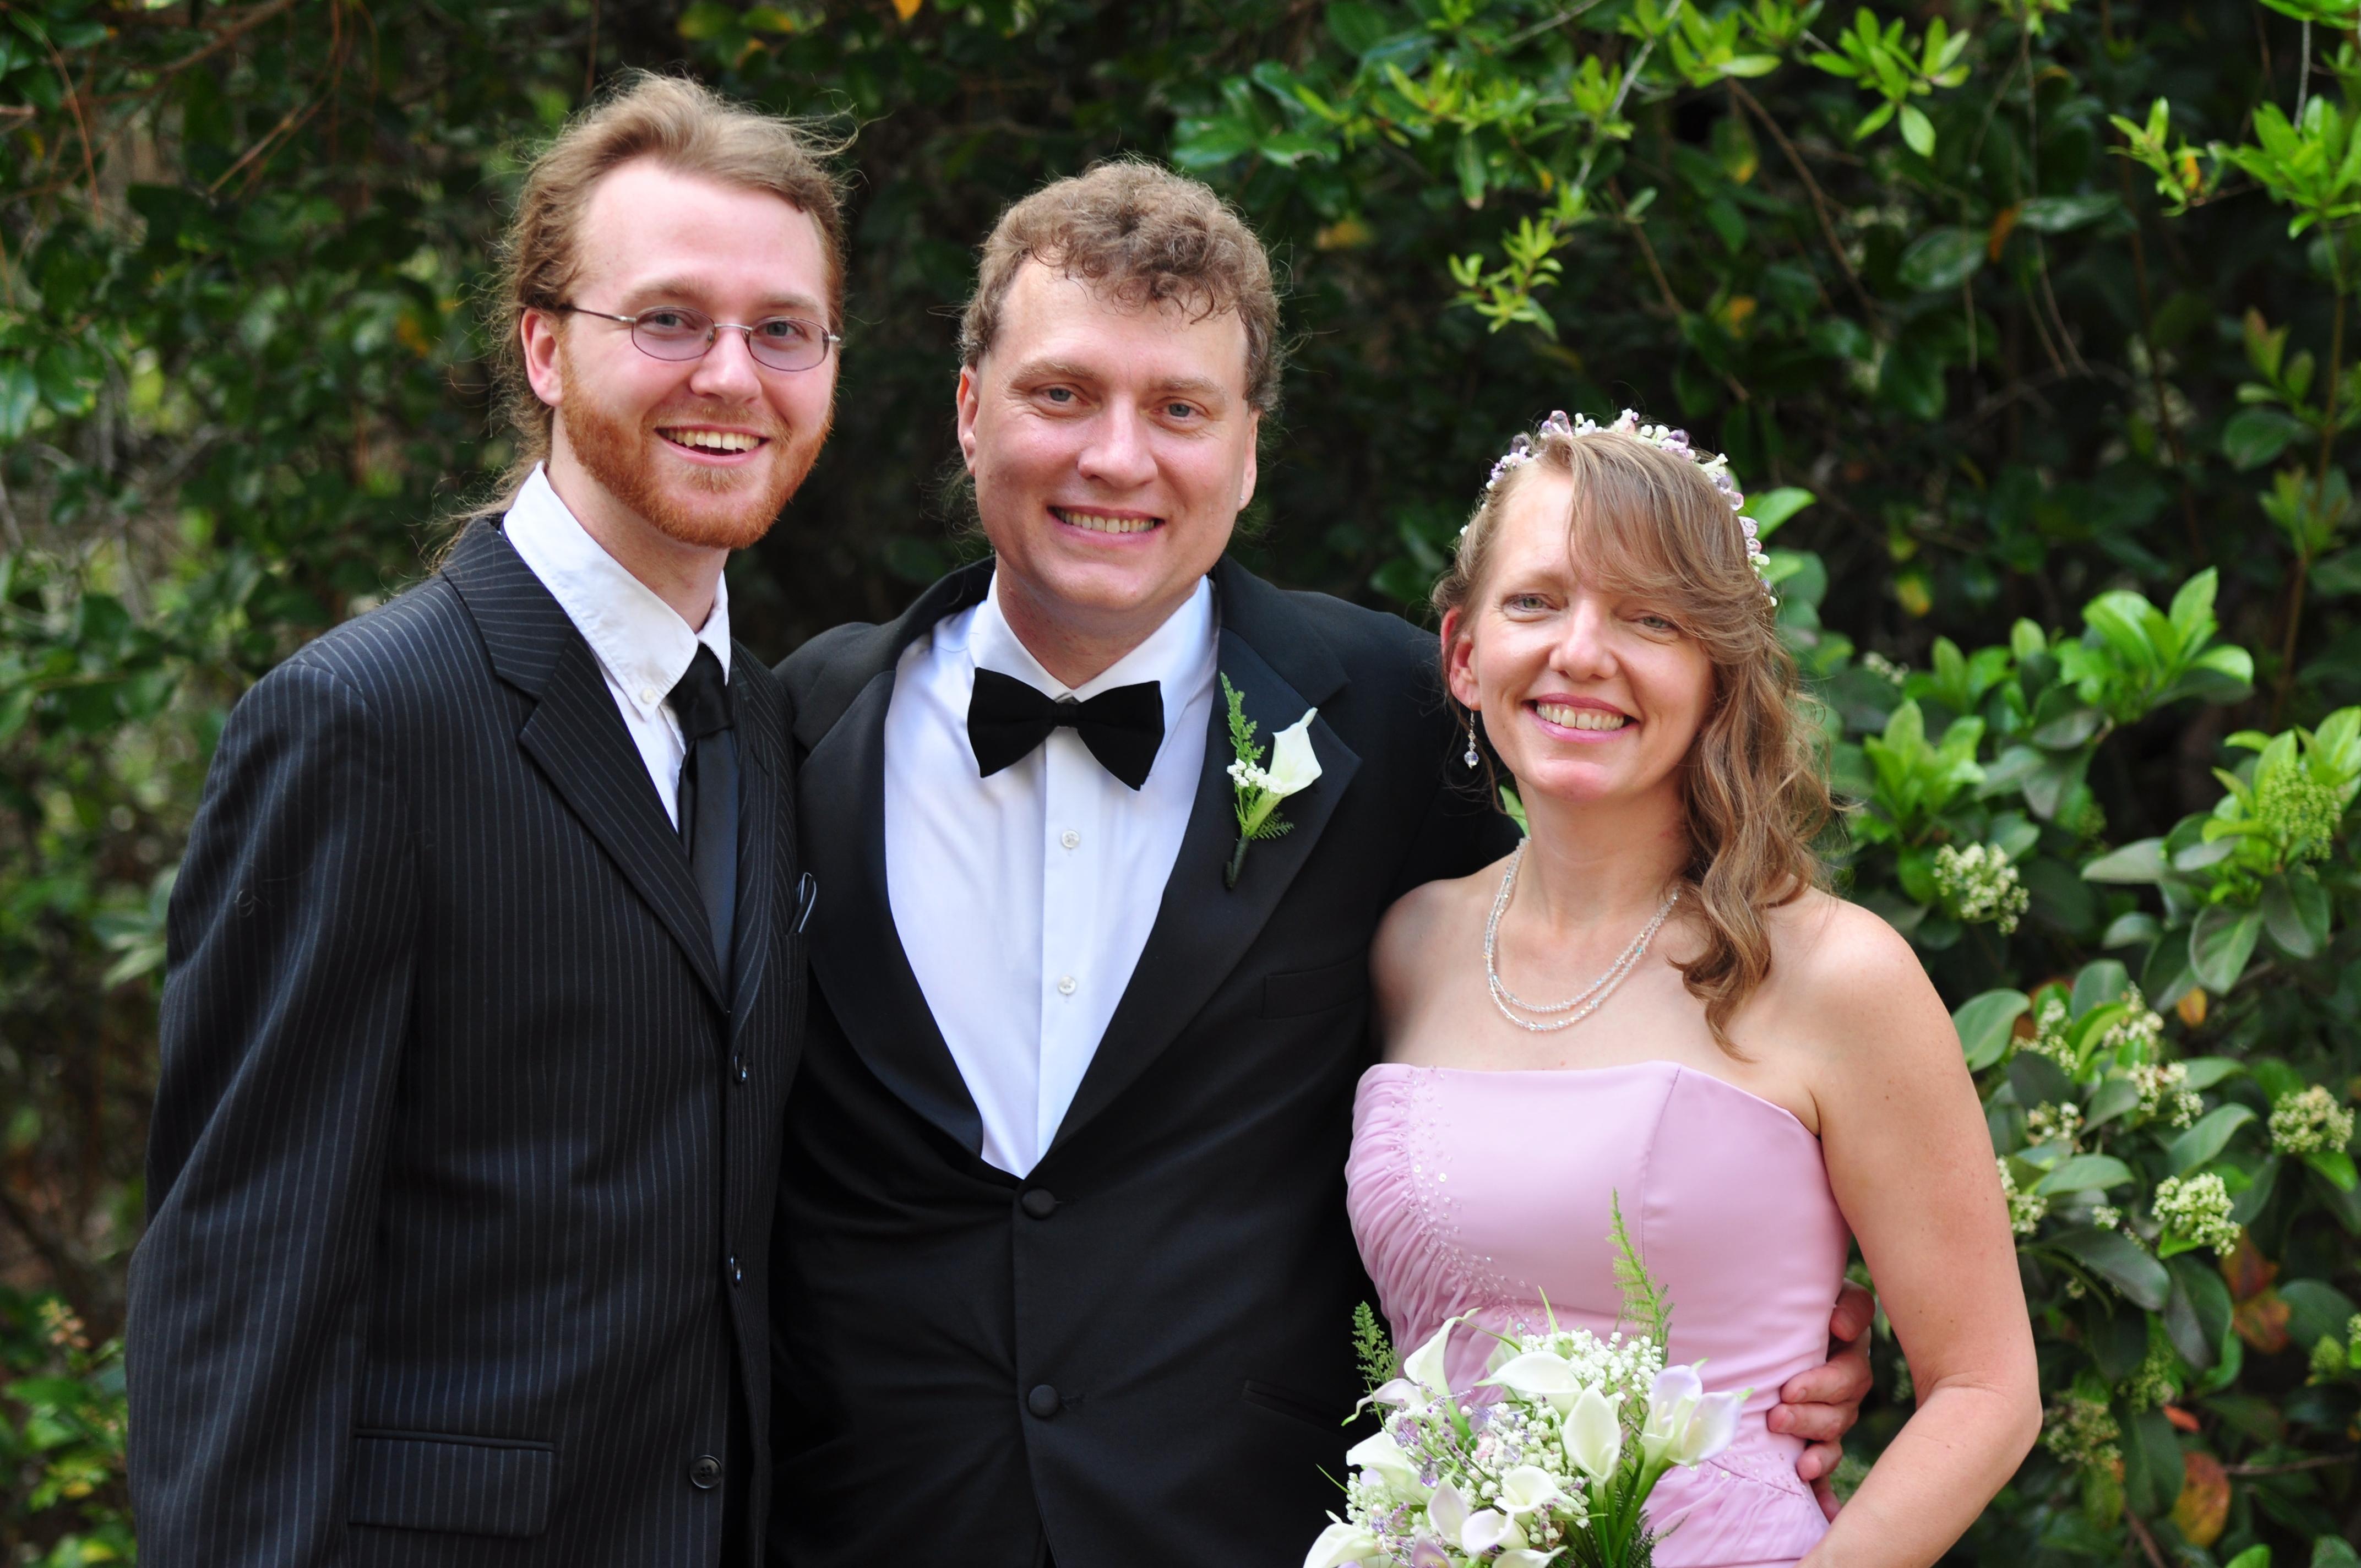 emily-and-travis-4-1-2013-april-fools-wedding-378